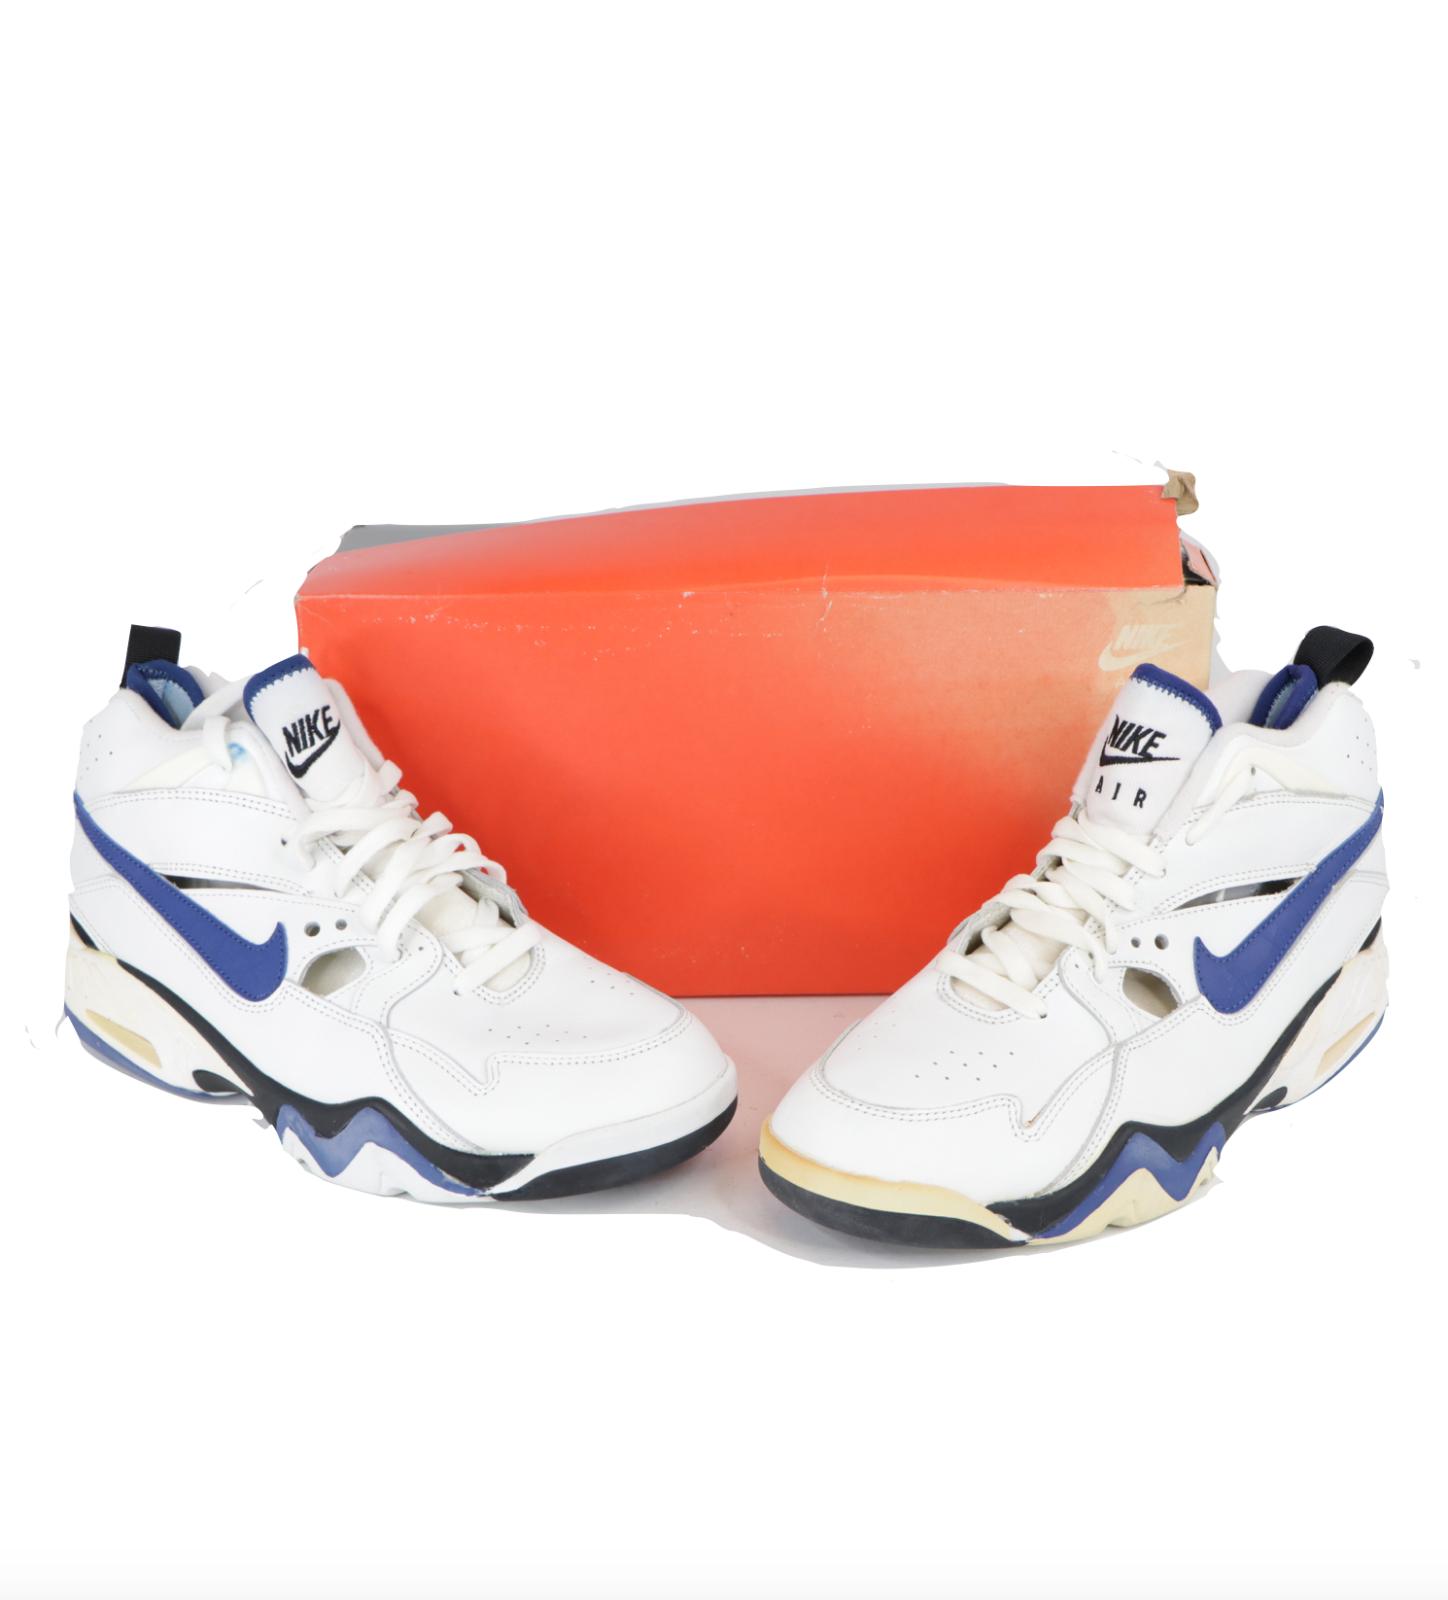 NOS Vintage 90s Nike Air Swift